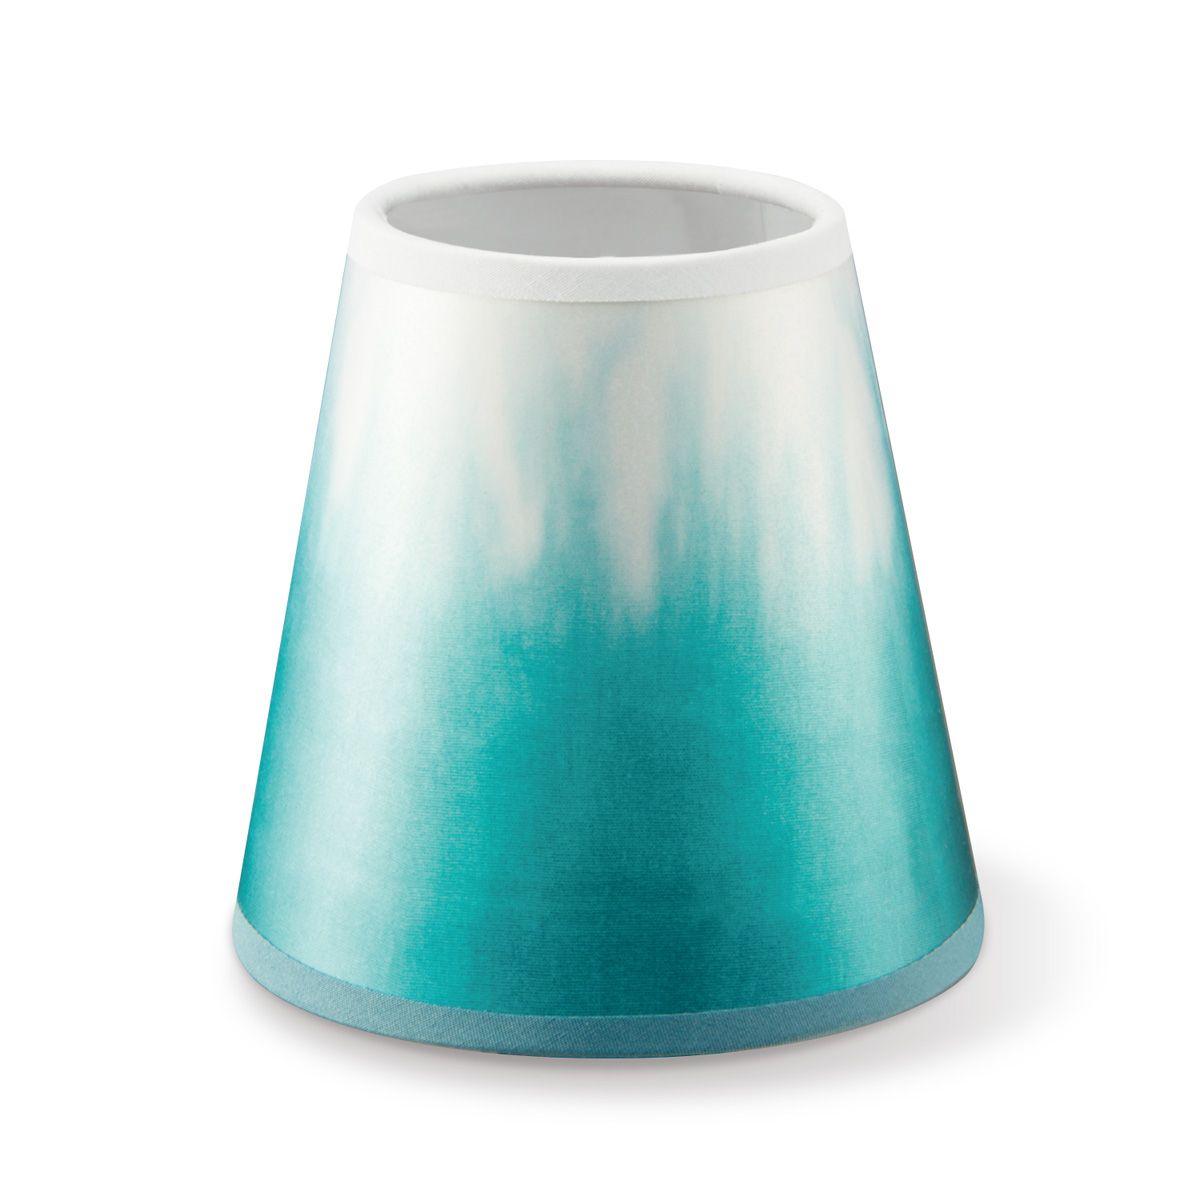 Home sweet home klemkap Dip - print wit/turquoise